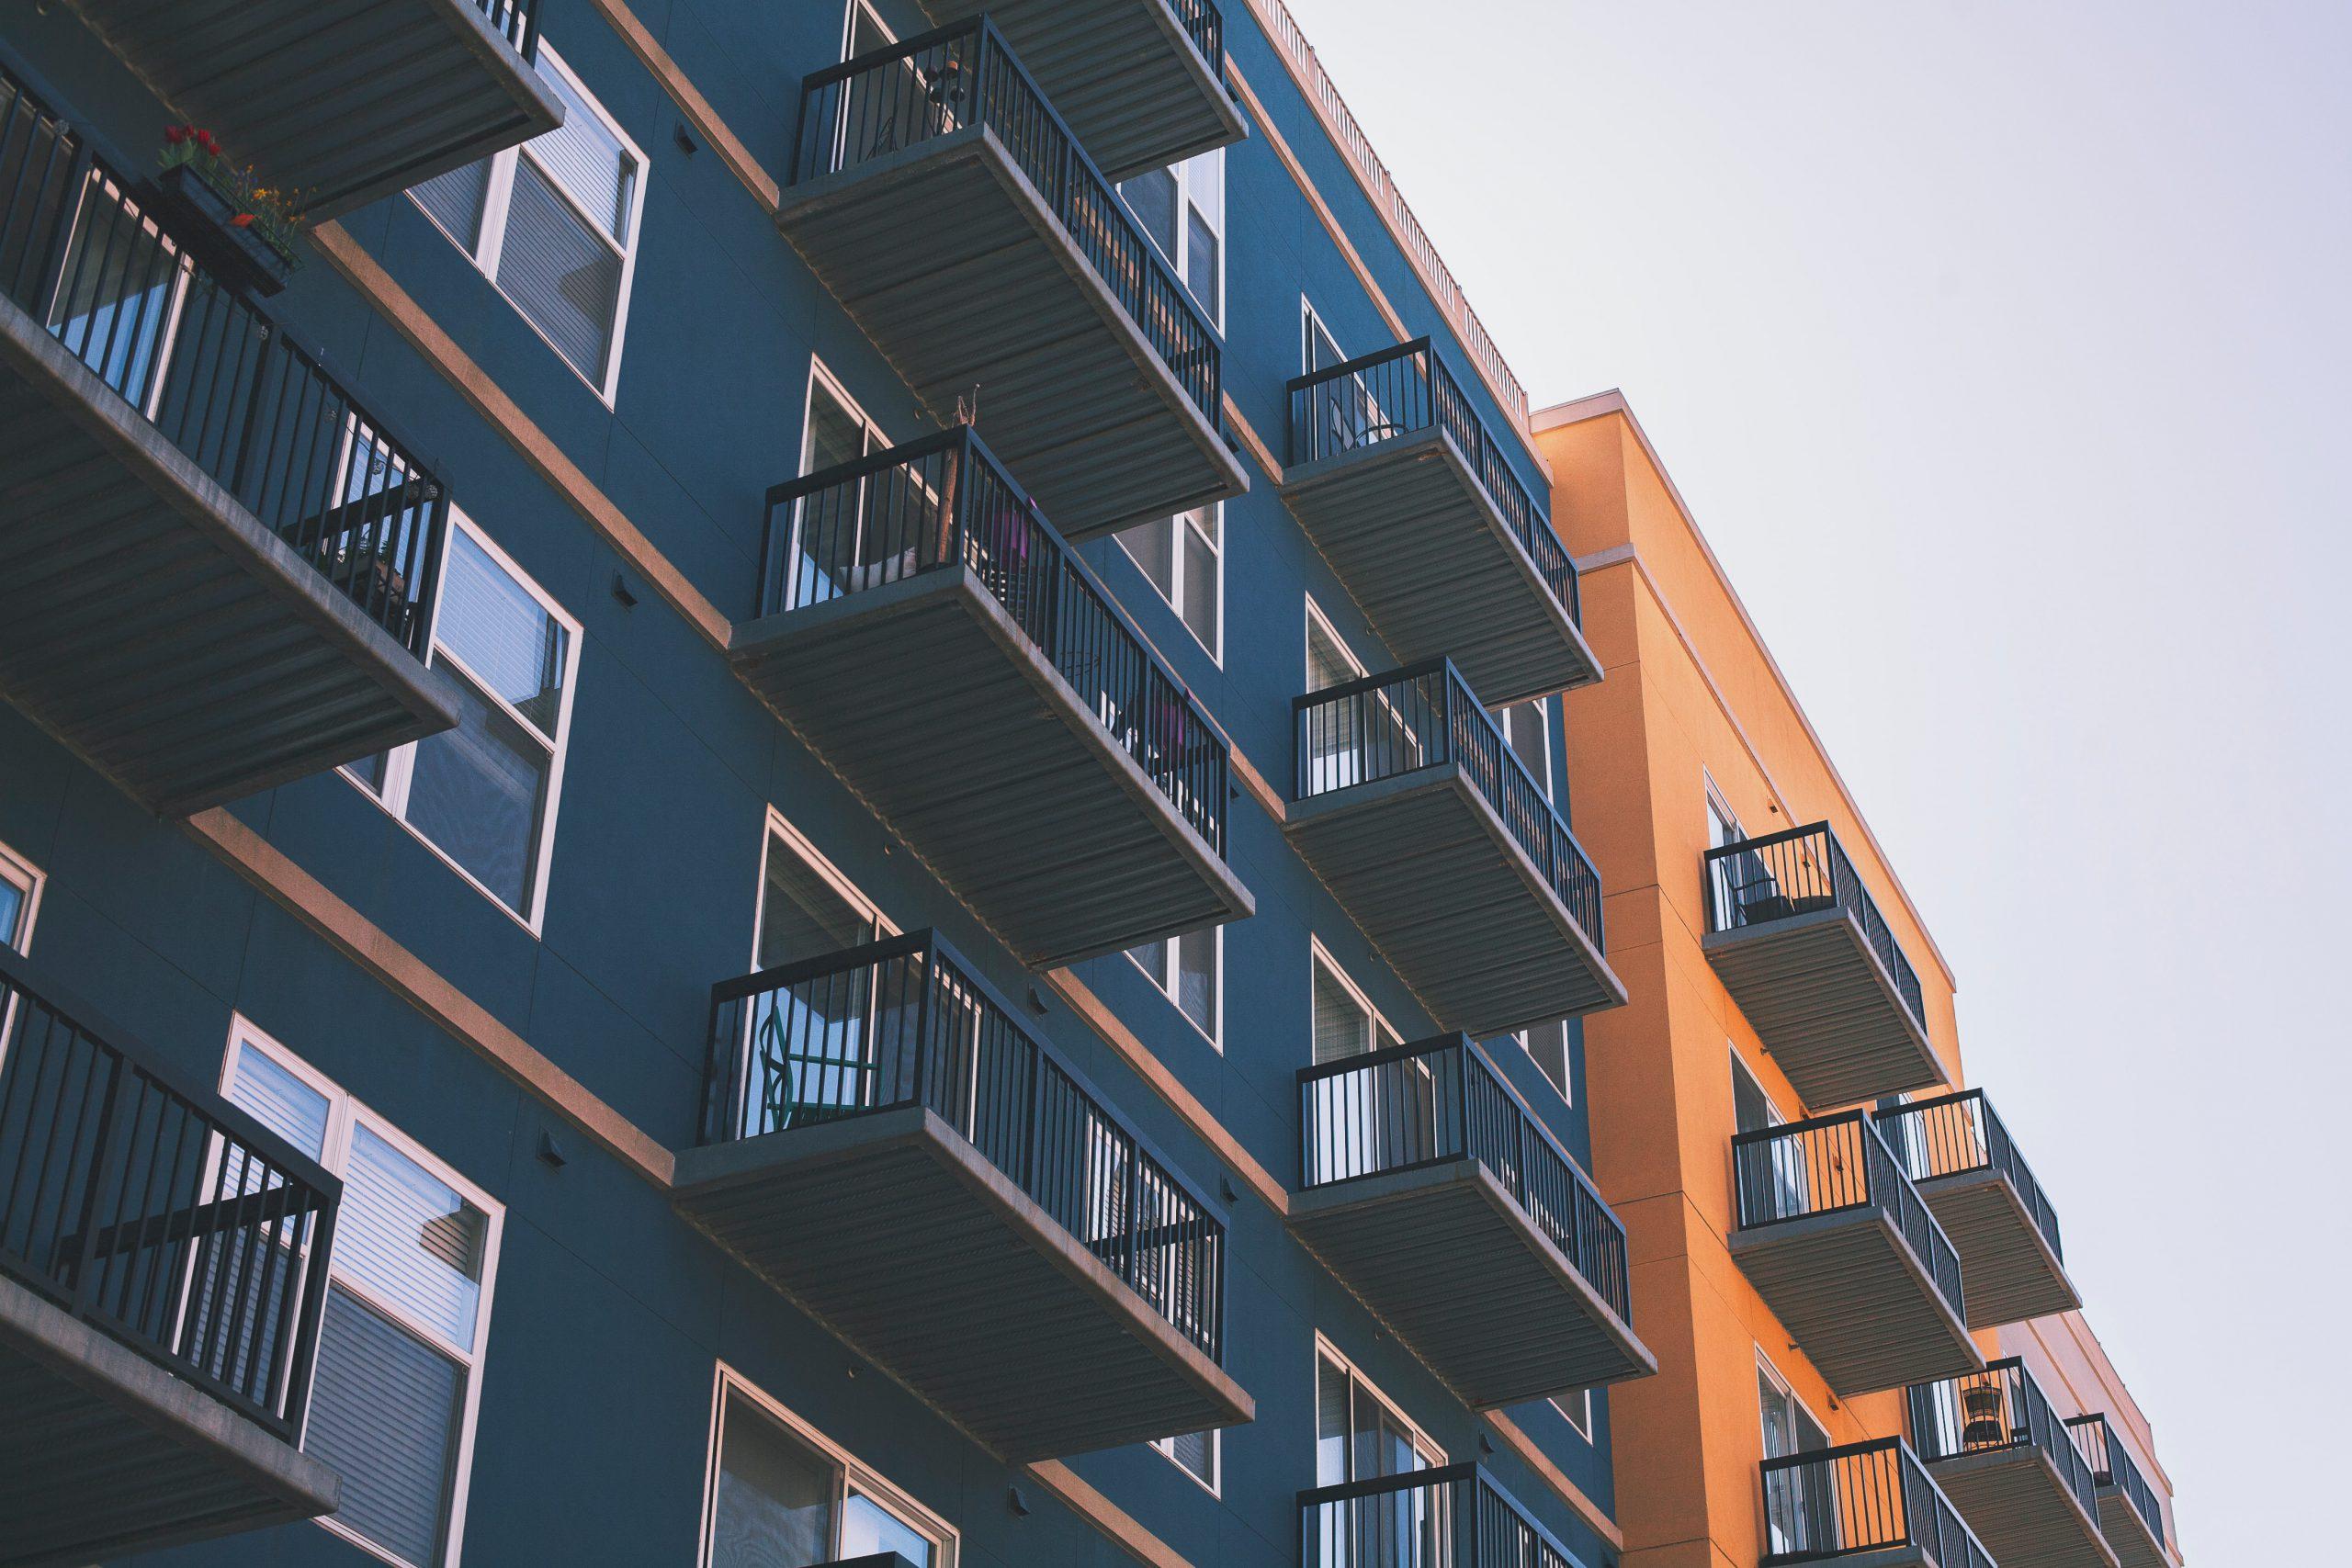 Decorative Image of a housing unit